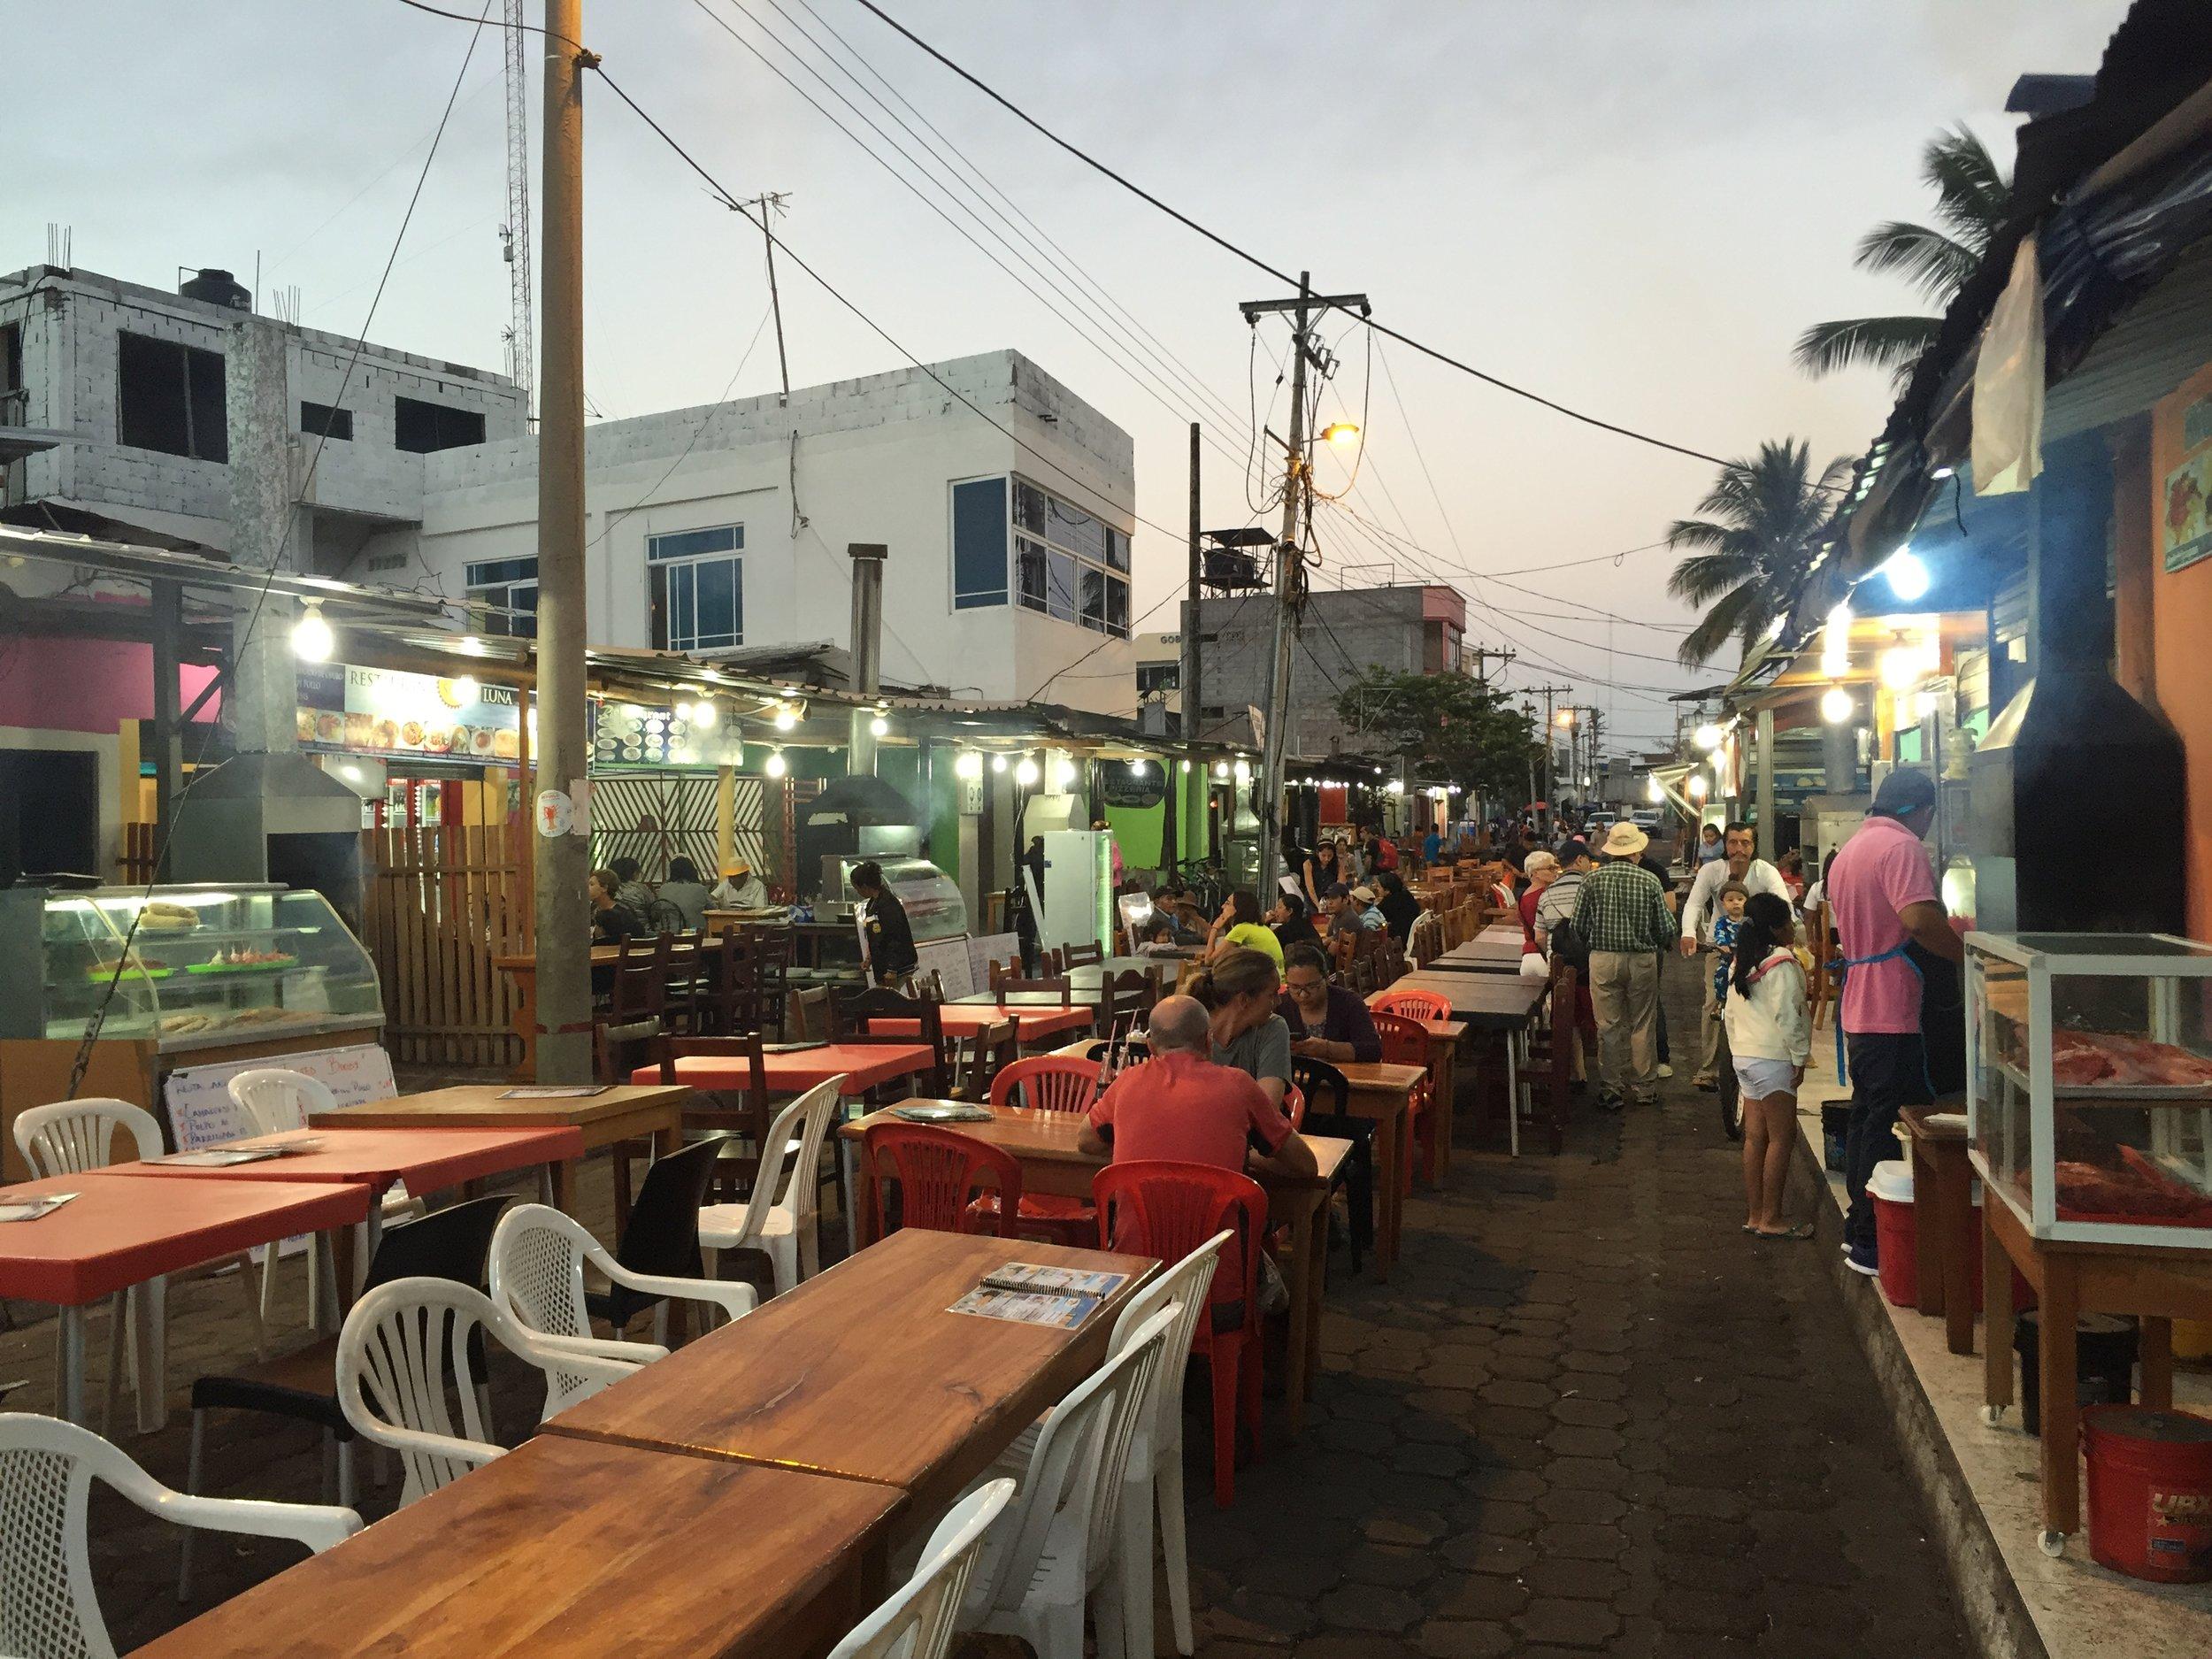 Kiosks serving up inexpensive eats on Charles Binford in Puerto Ayora